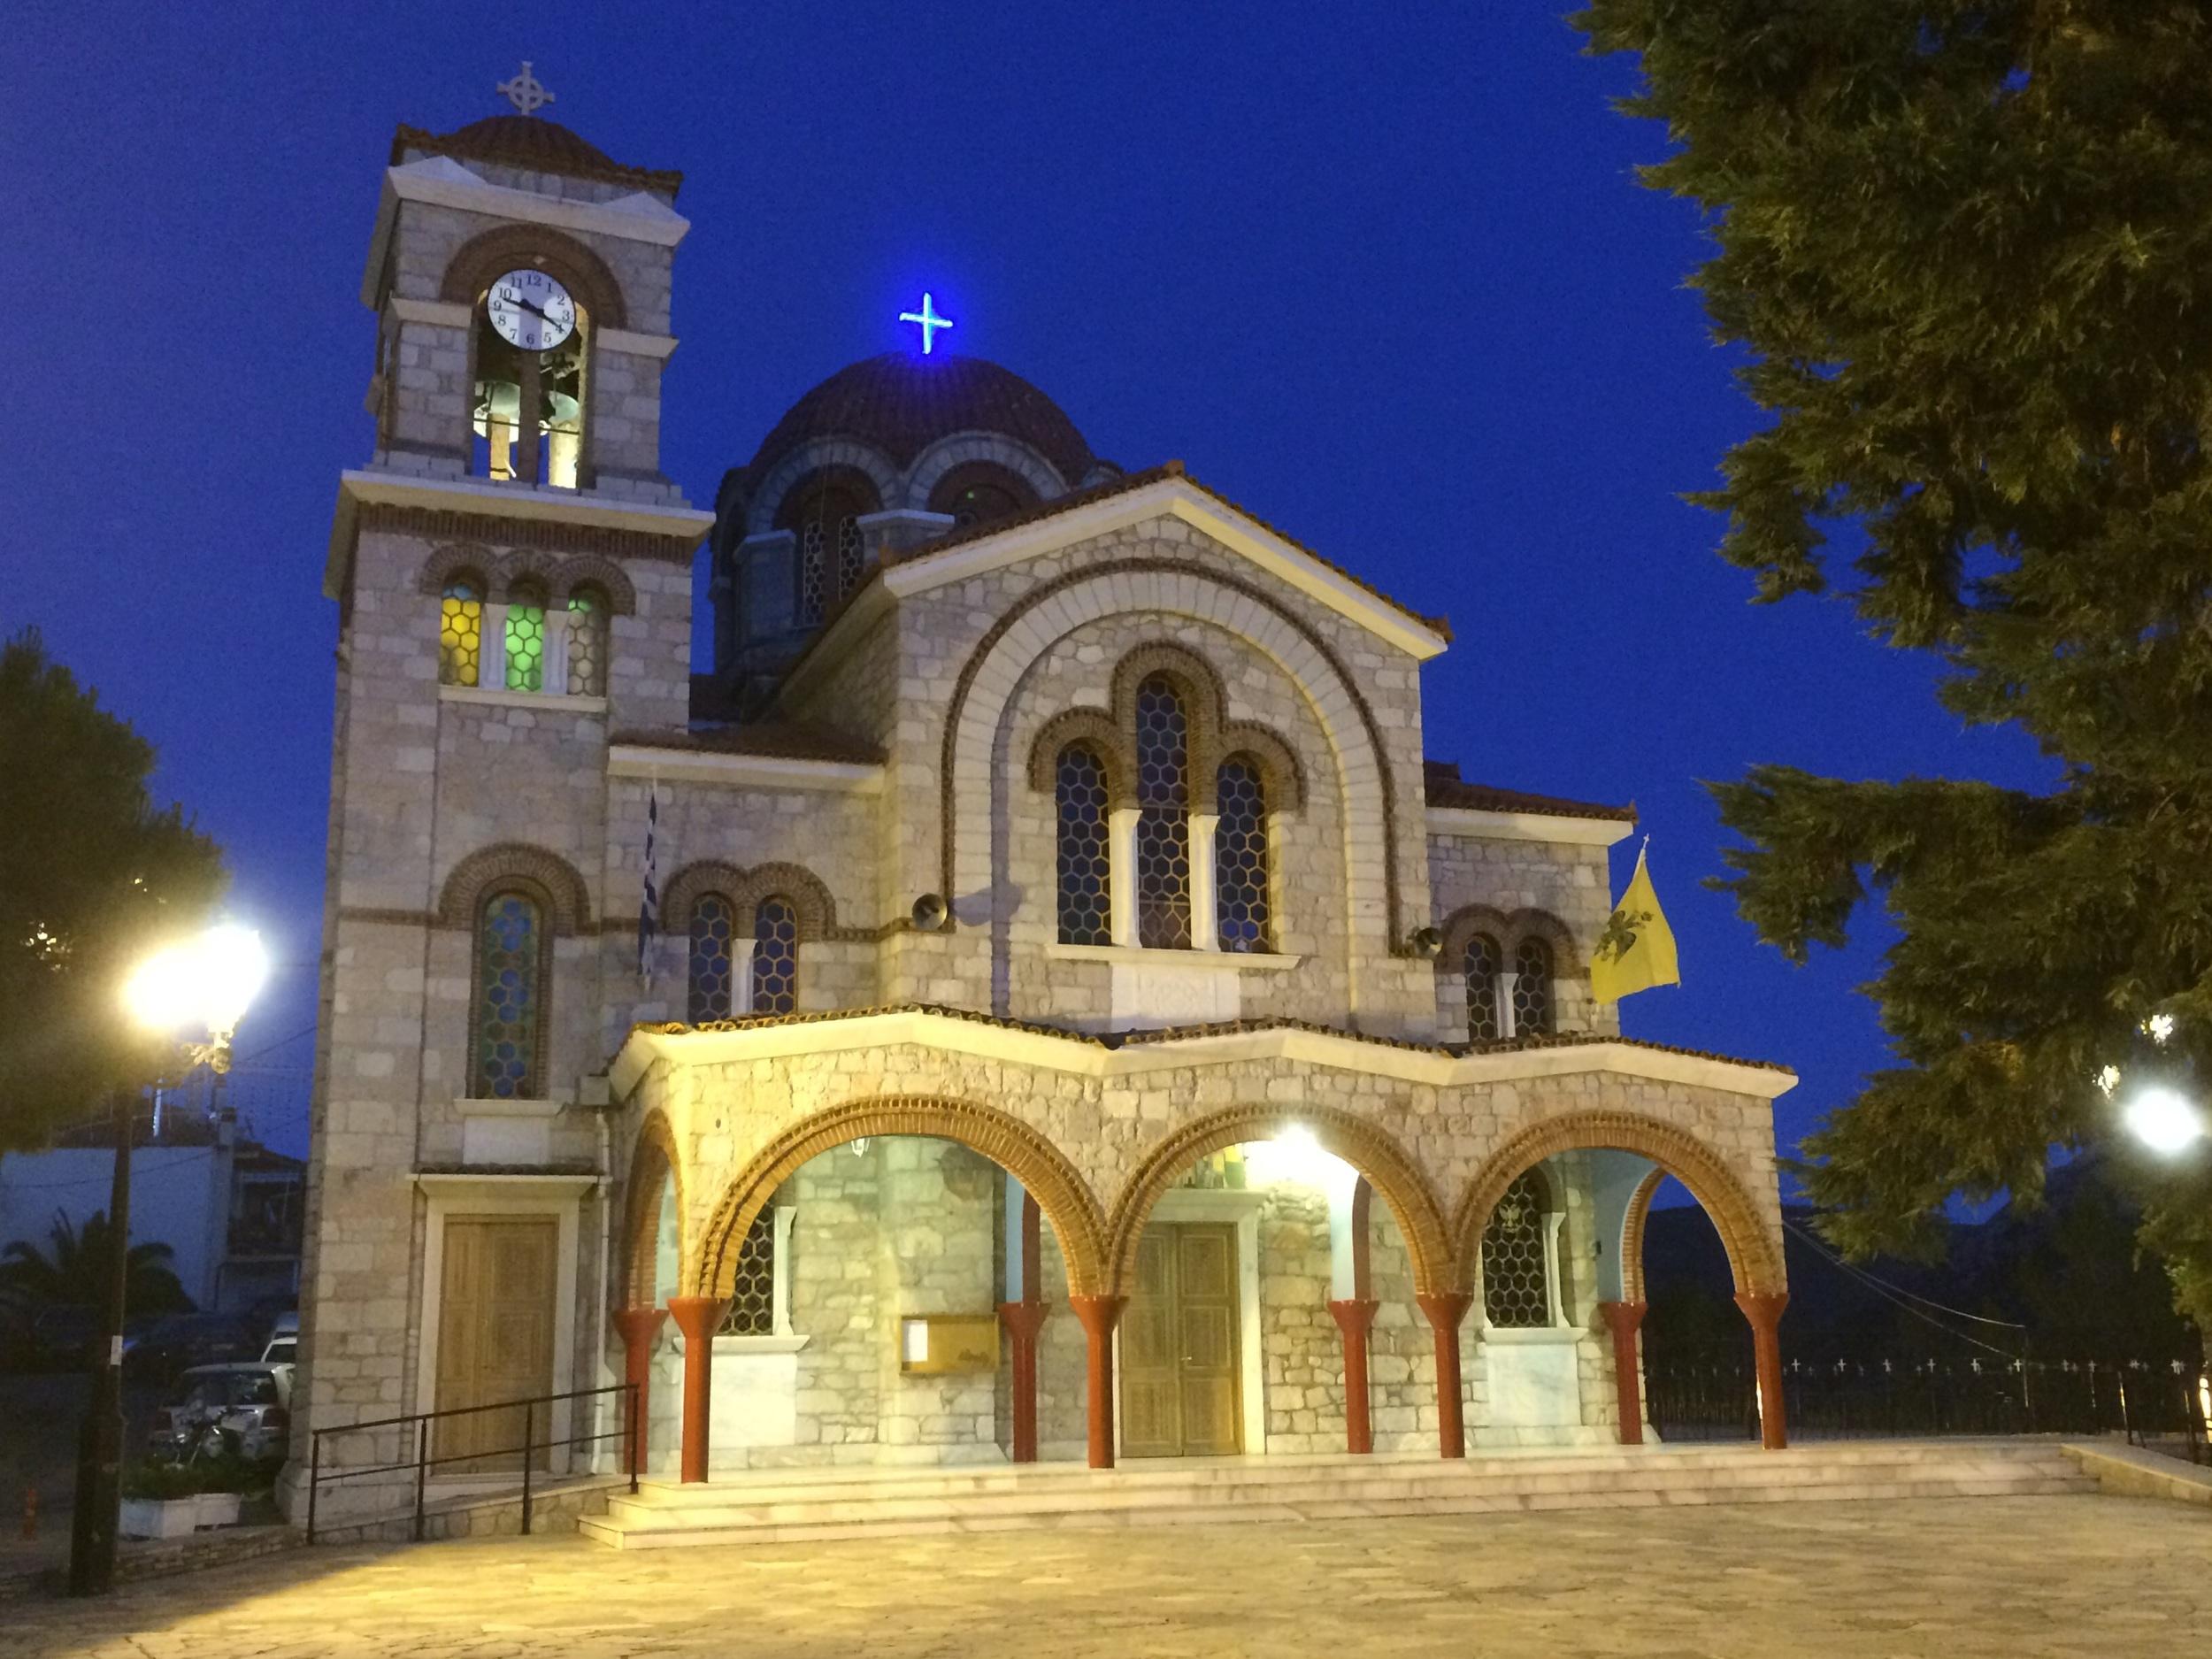 Church in Delphi at night. Rad cross.